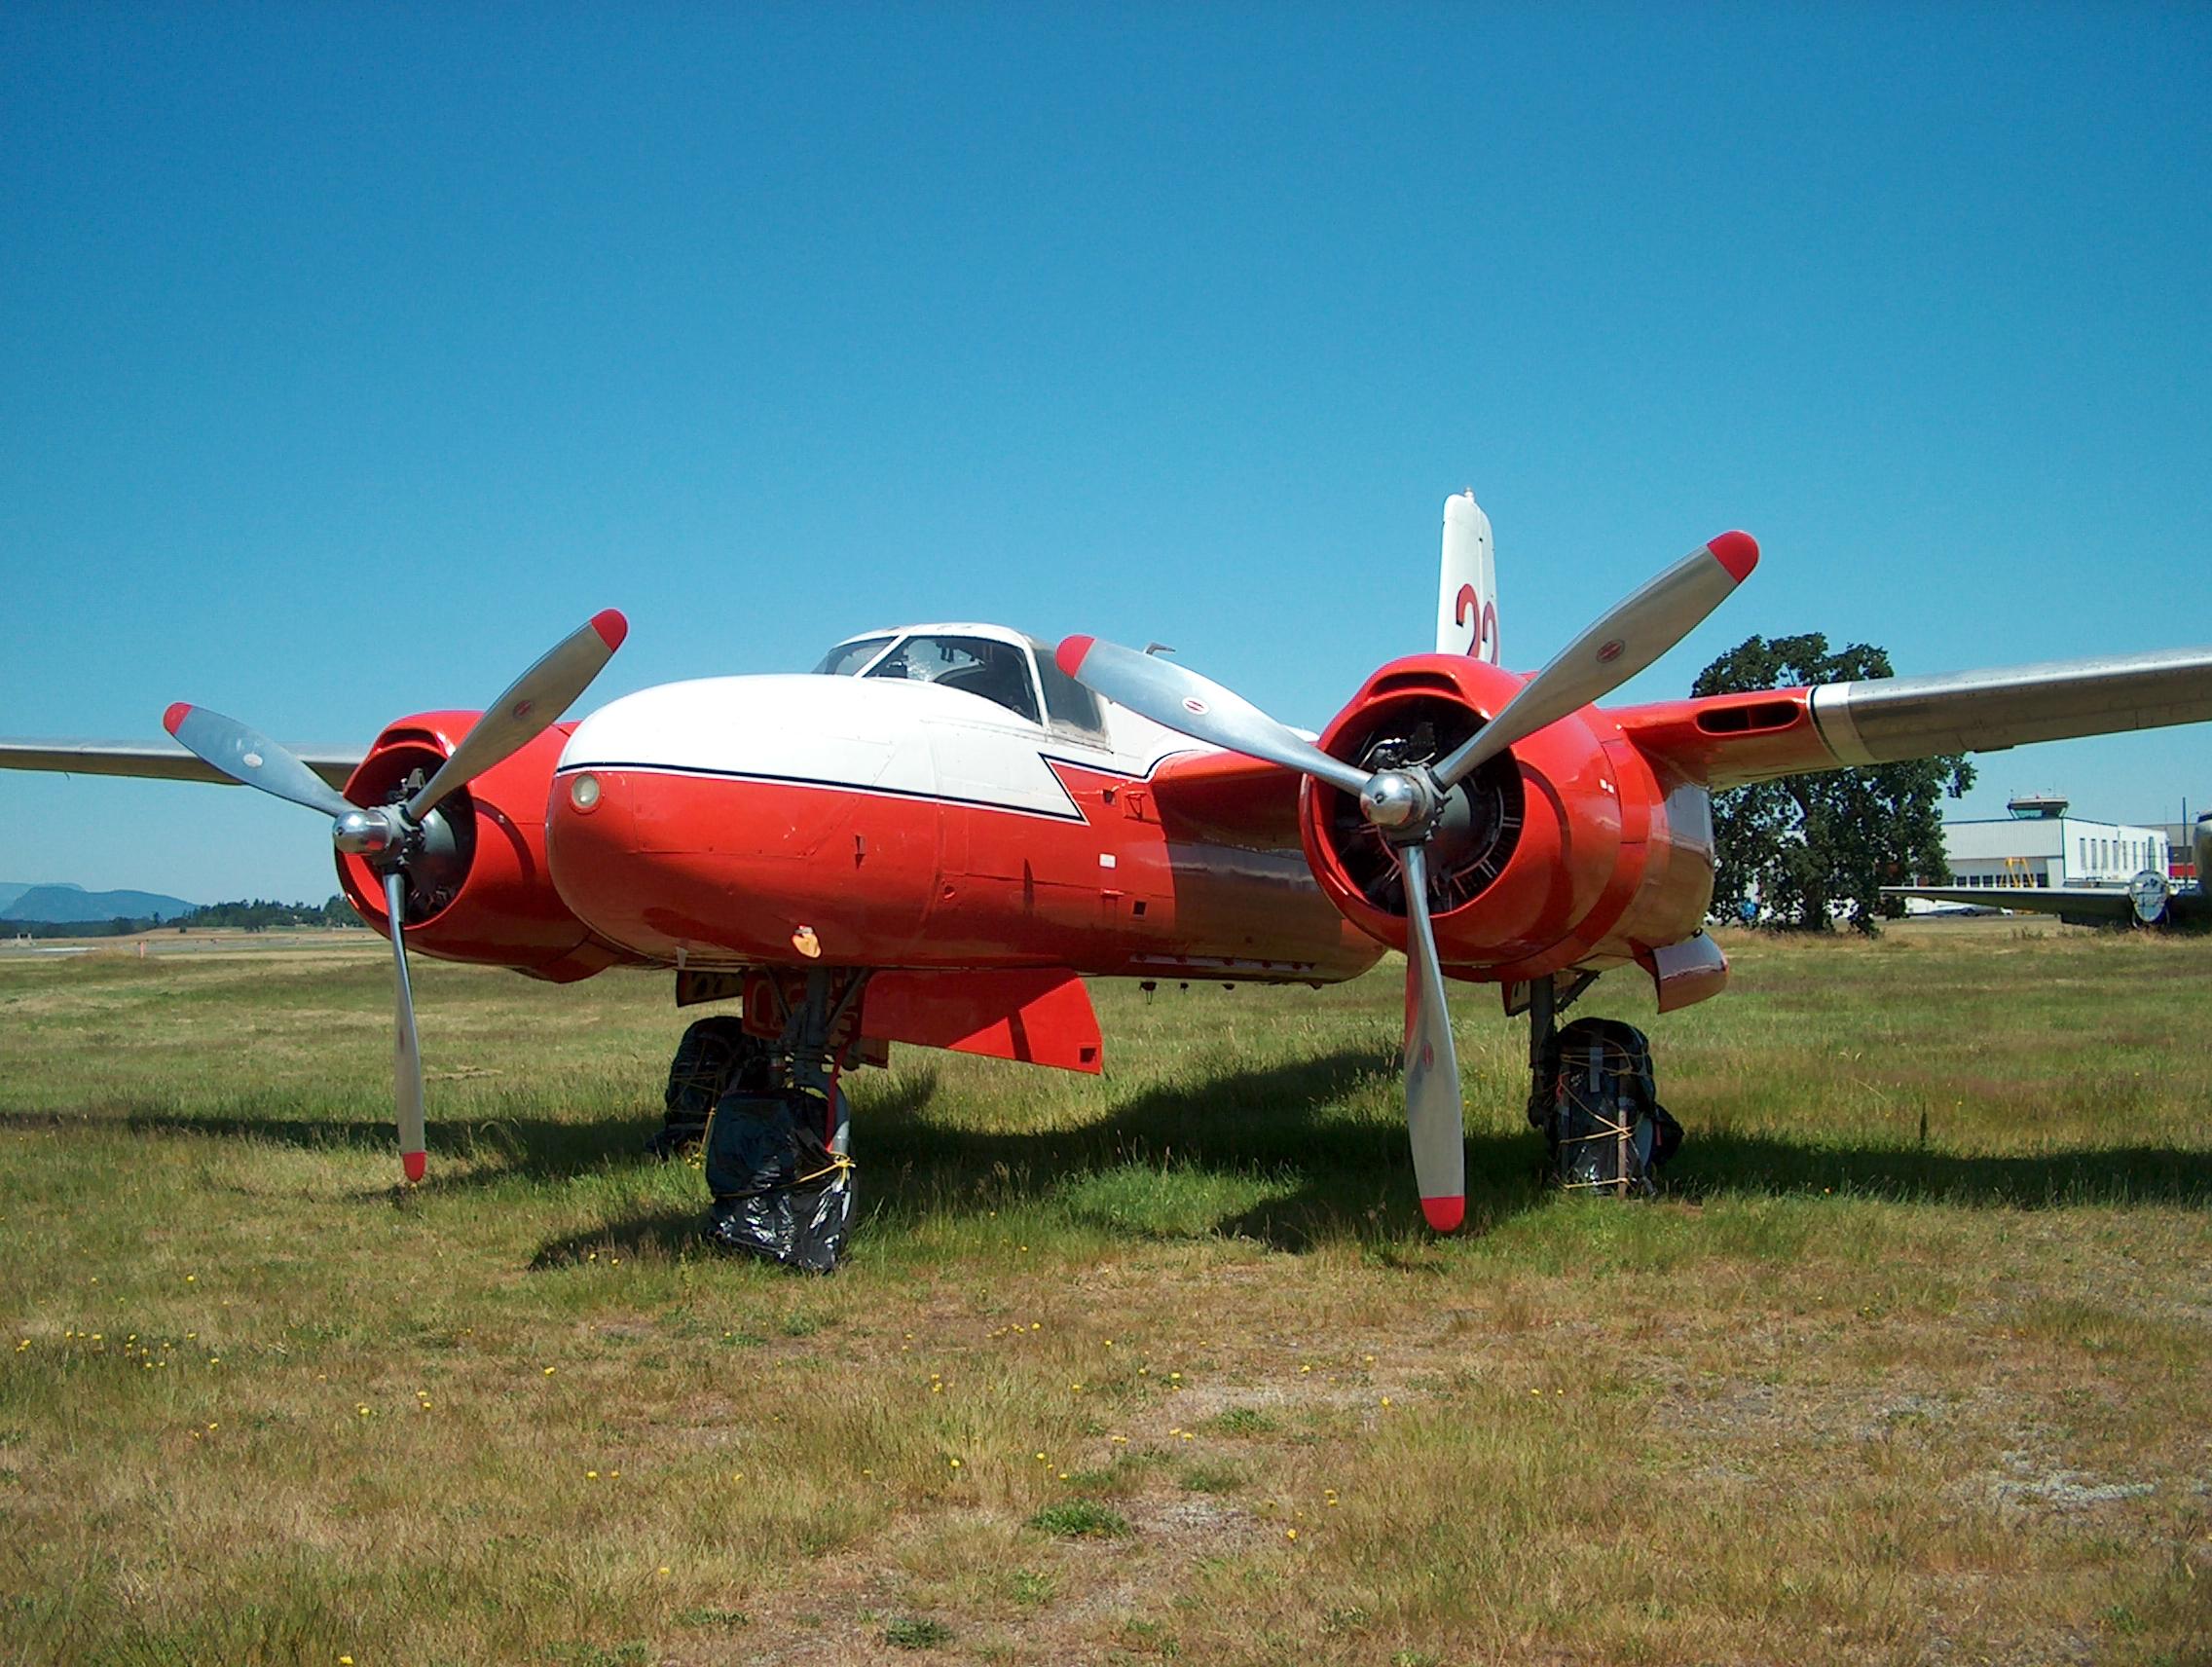 File:B-26 water bomber.JPG - Wikimedia Commons